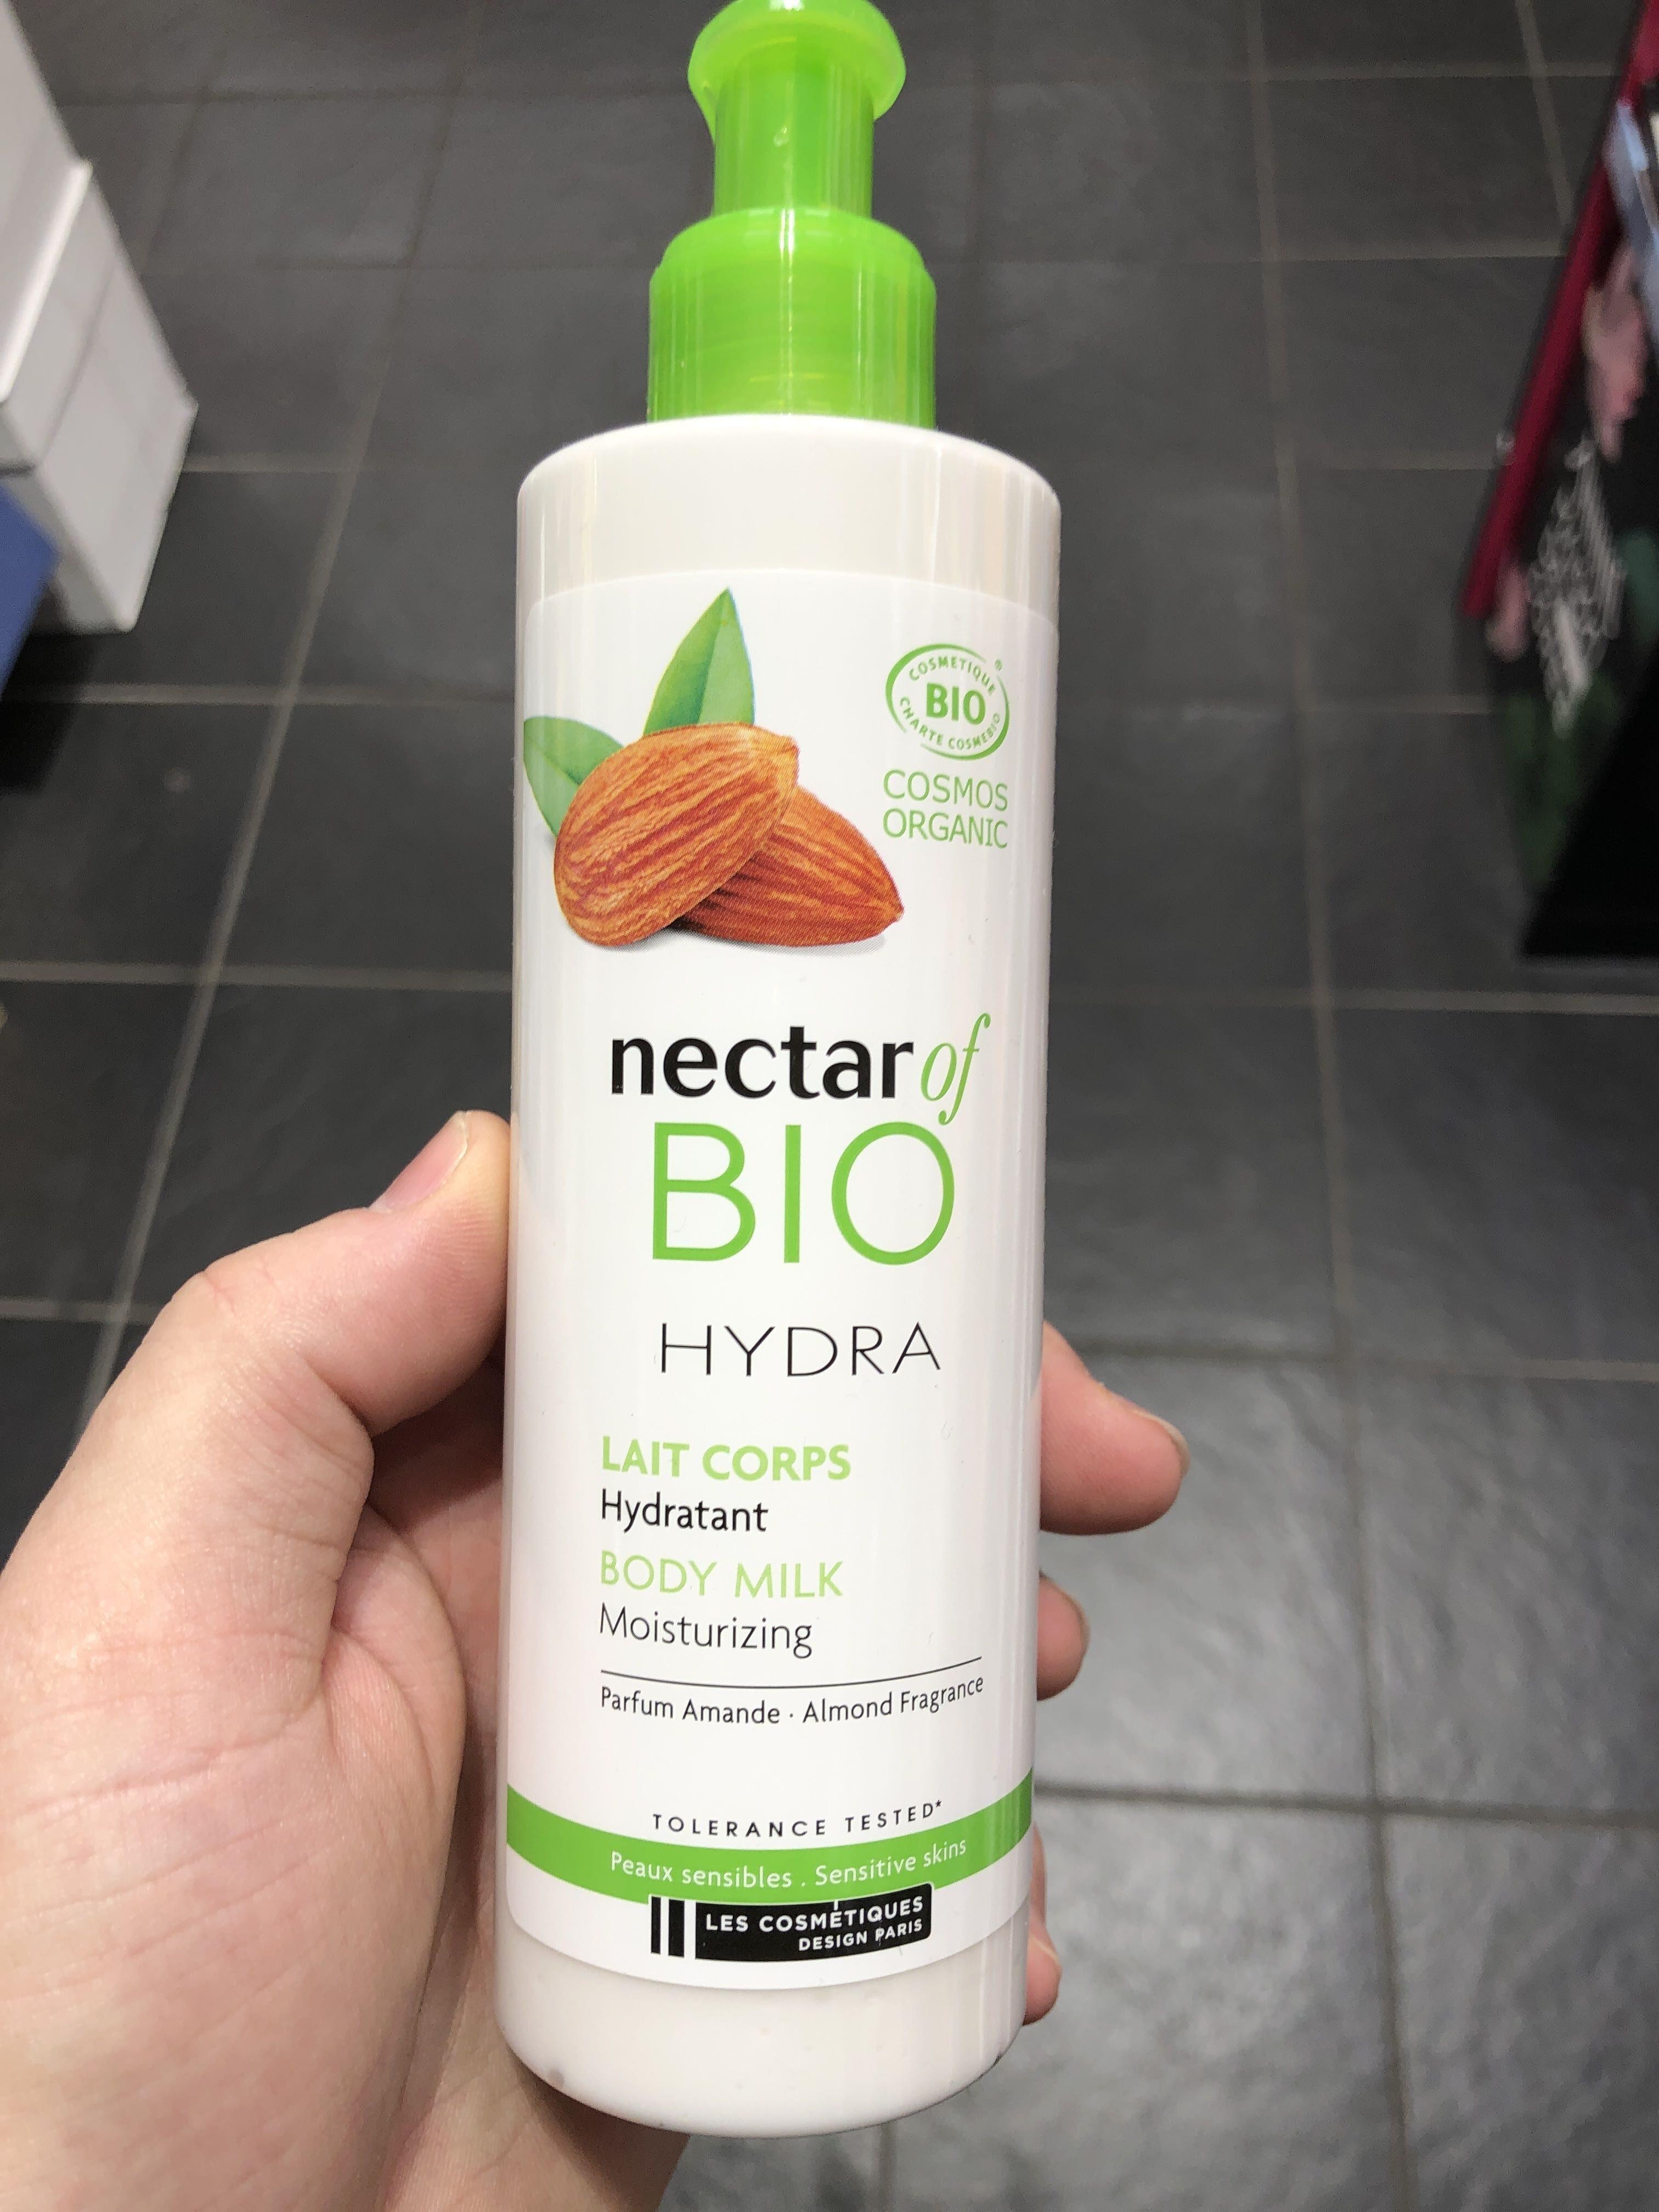 Nectar of Bio - Product